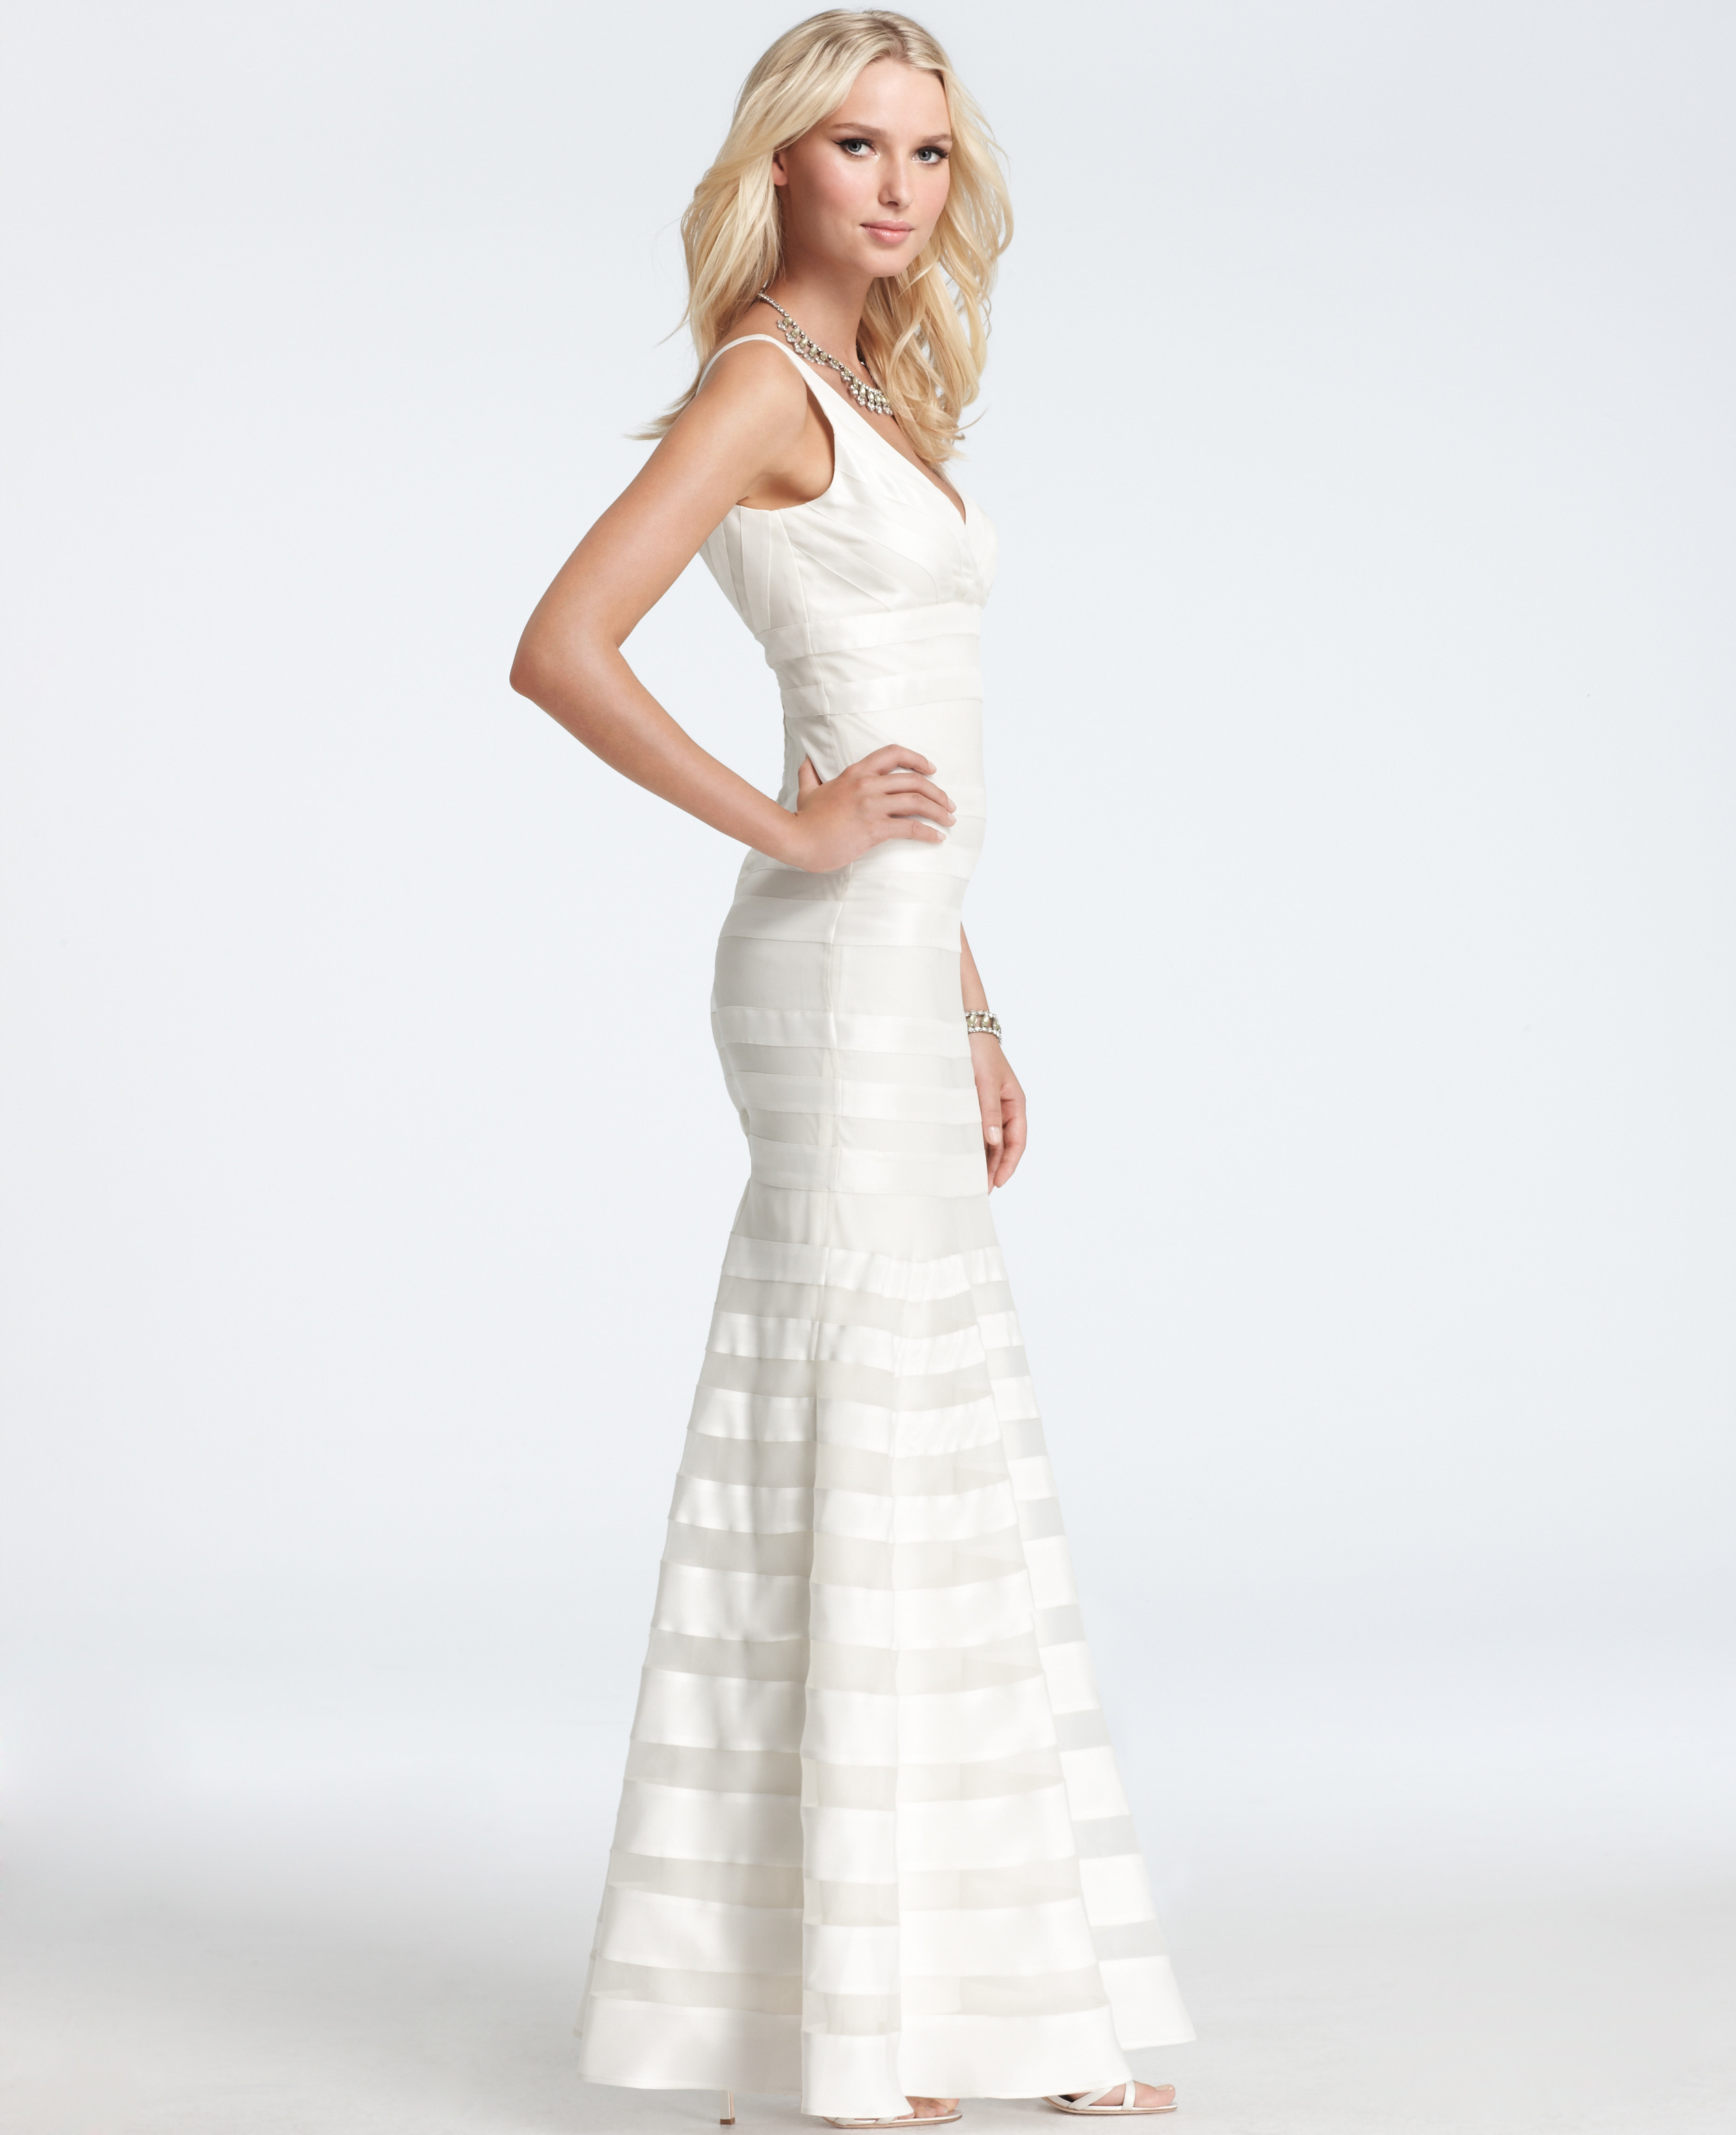 Ann taylor silk georgette mermaid wedding dress in white for Anne taylor wedding dress